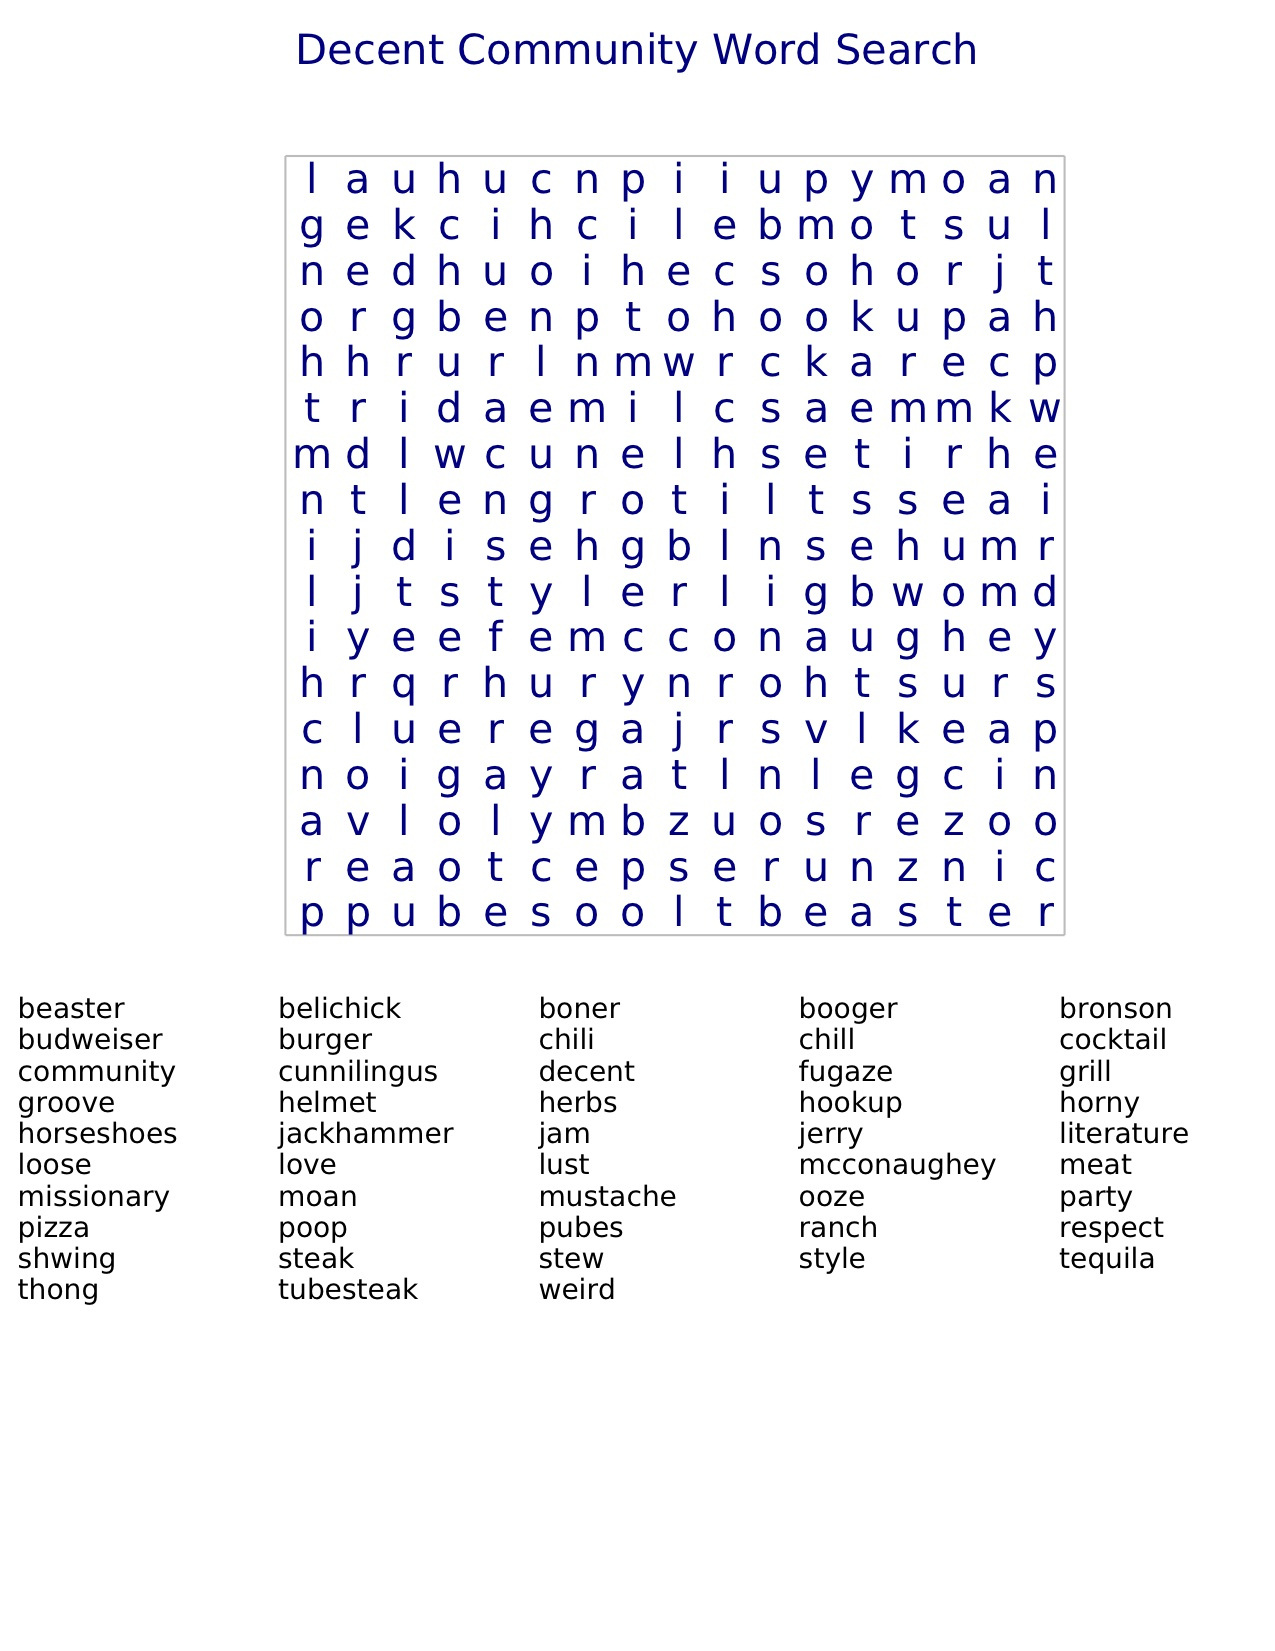 Decent Community Word Search | Decent Community